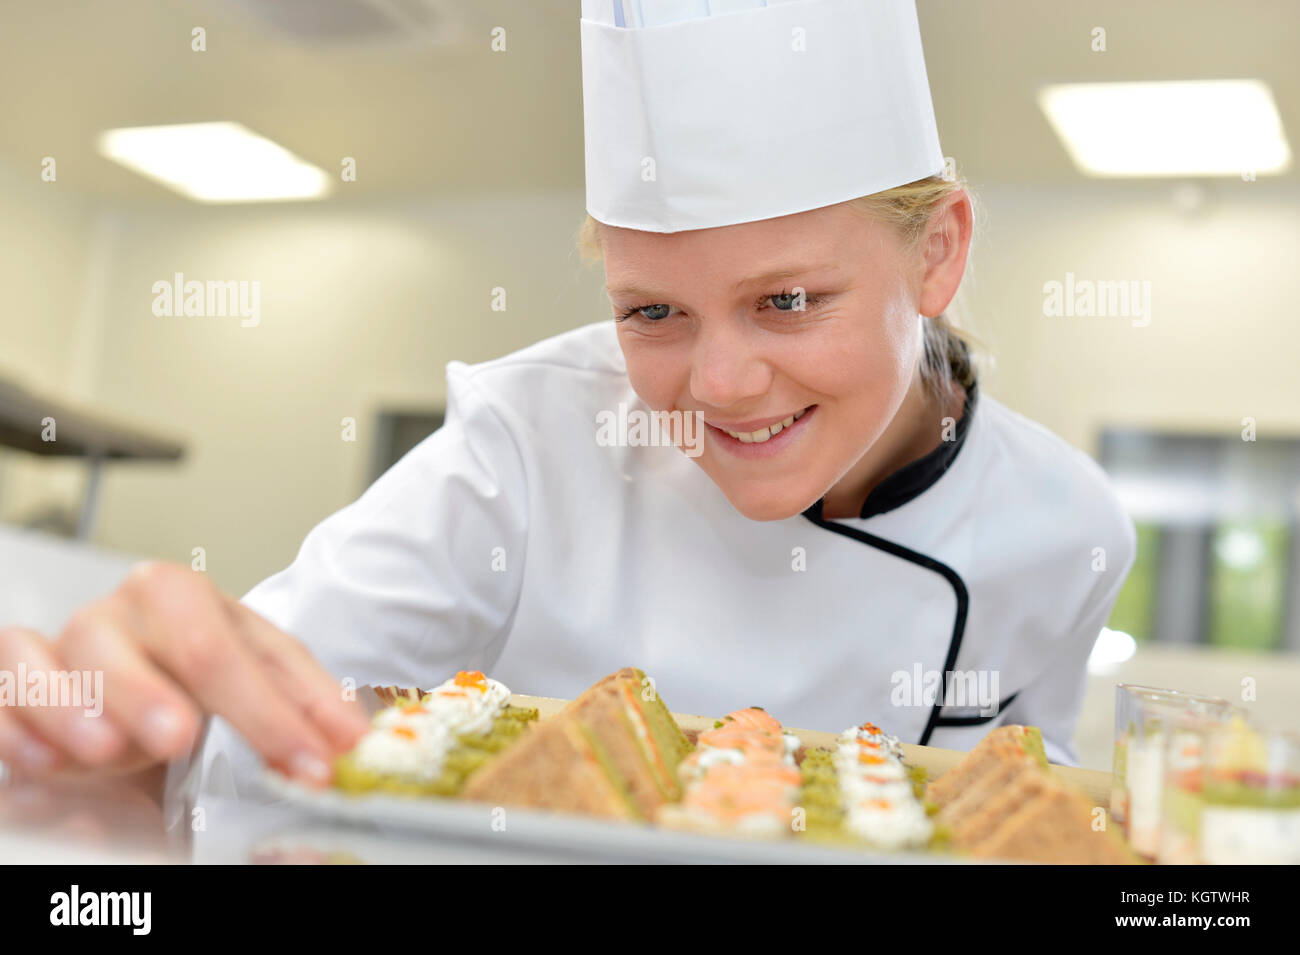 Junge Fach an Vorspeisen Caterer vorbereiten Stockbild